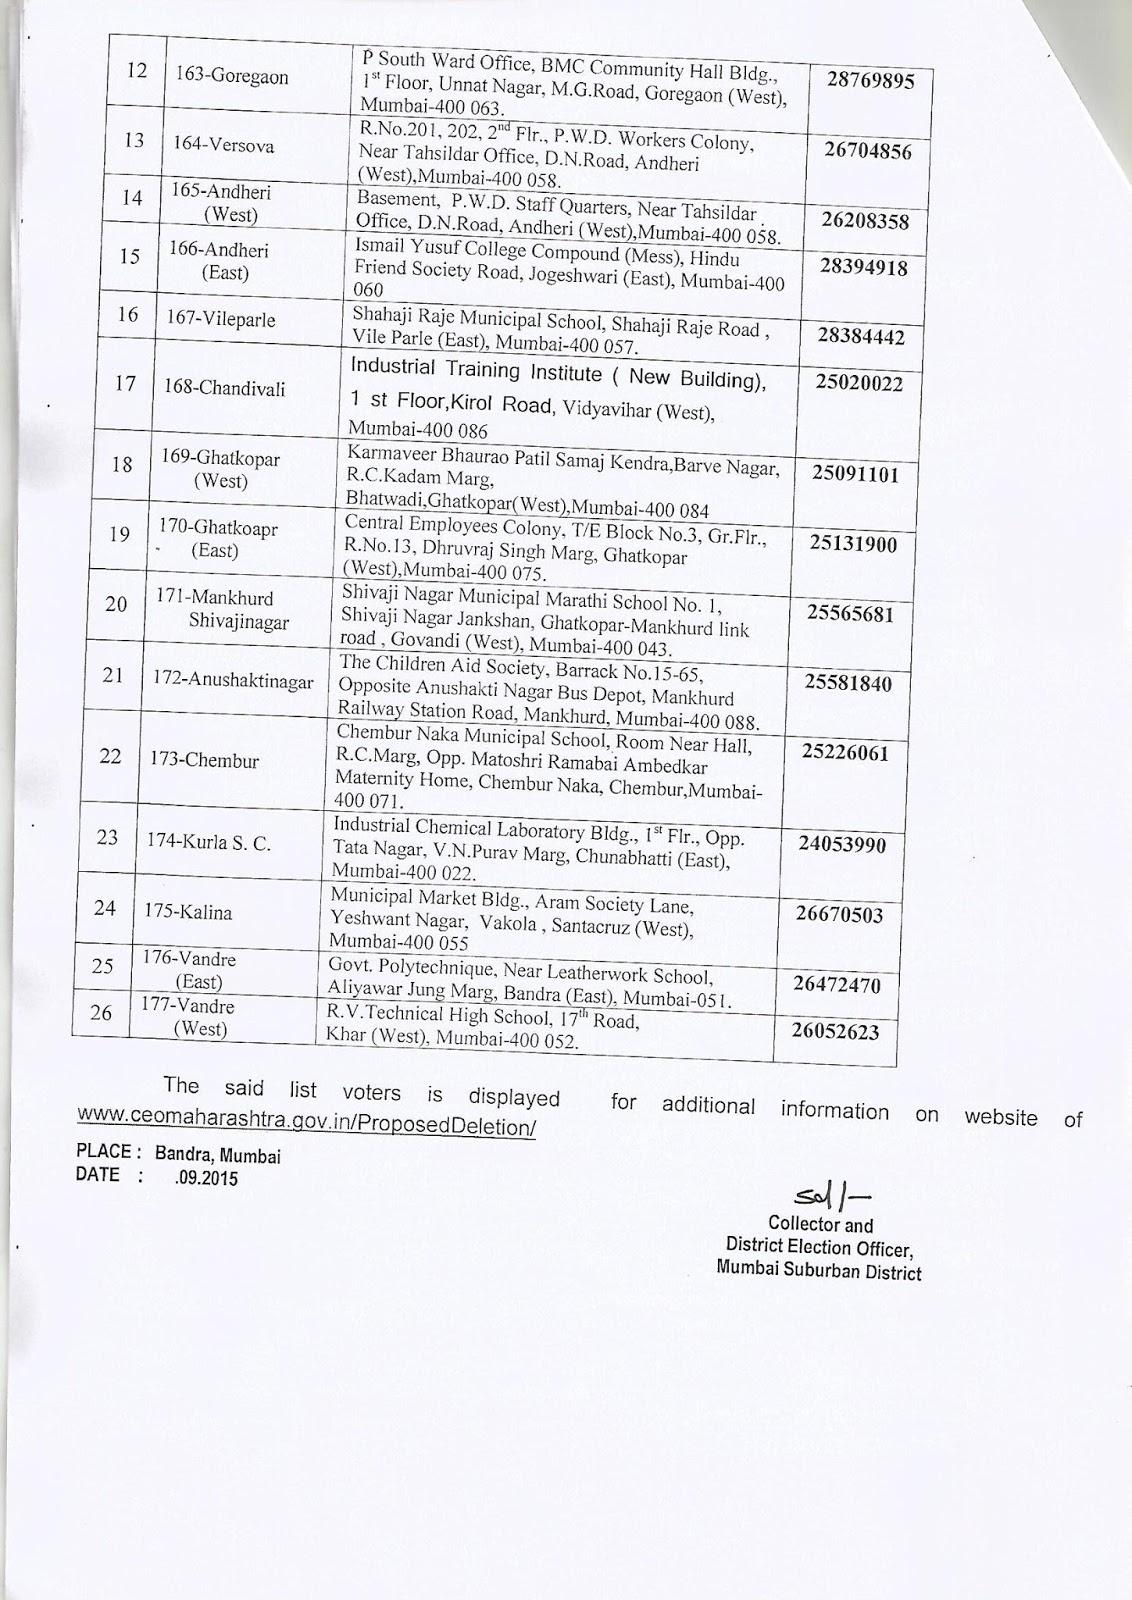 ELECTION MUMBAI SUBURBAN DISTRICT: Draft List of Proposed